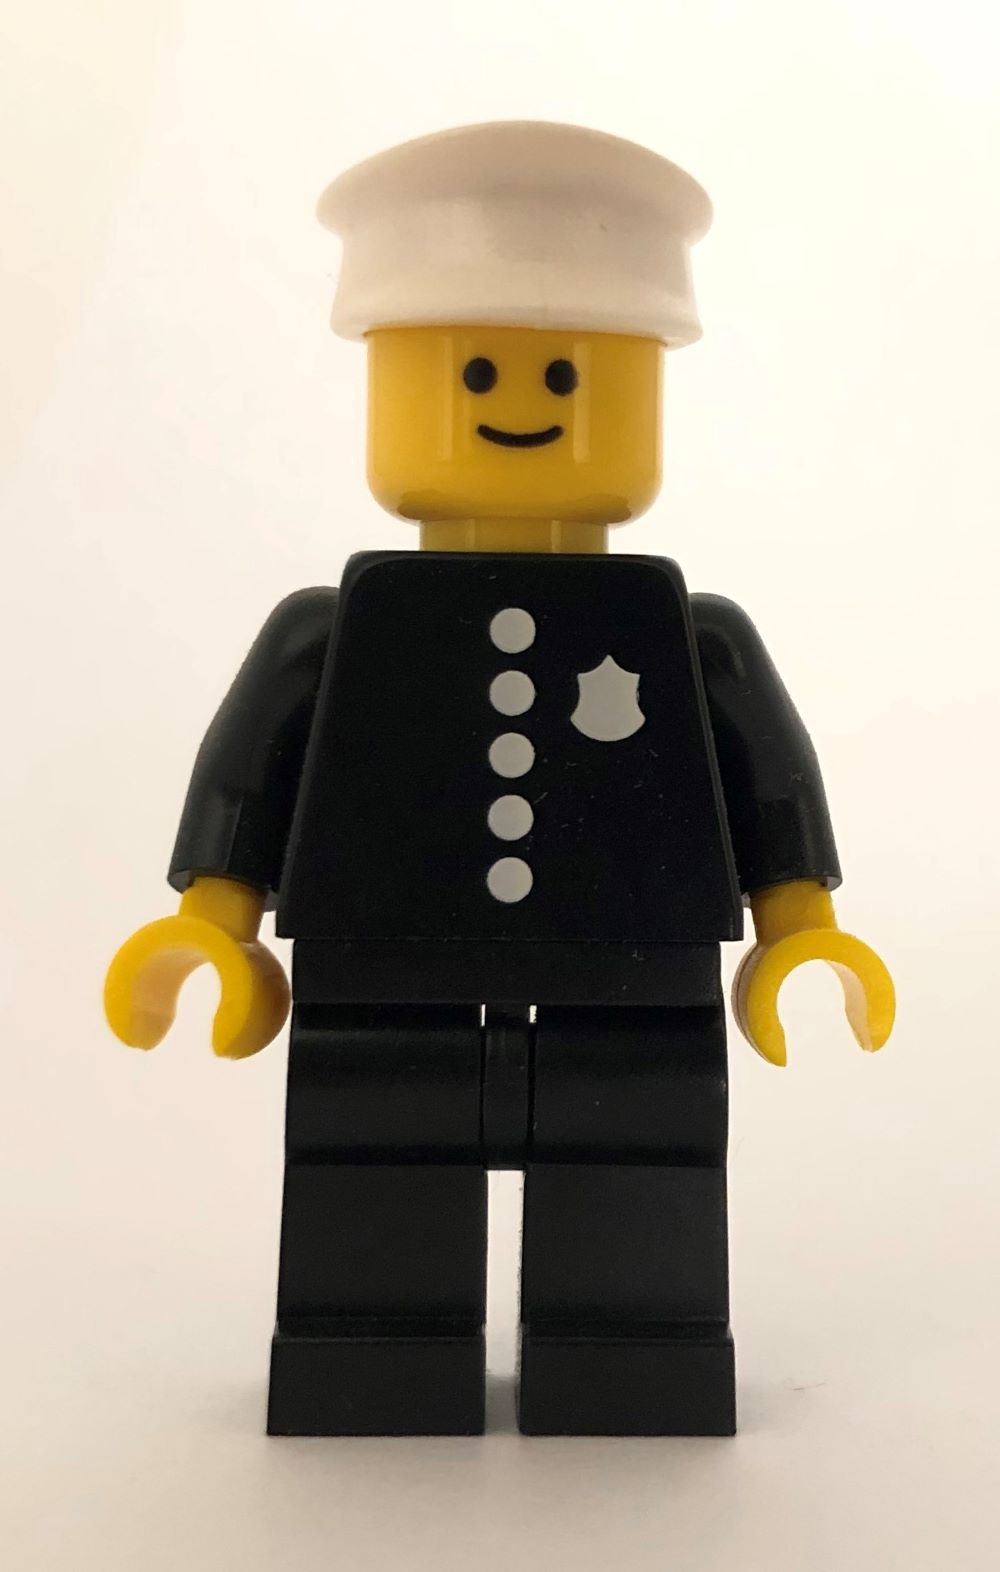 lego terimler sözlüğü lego polis